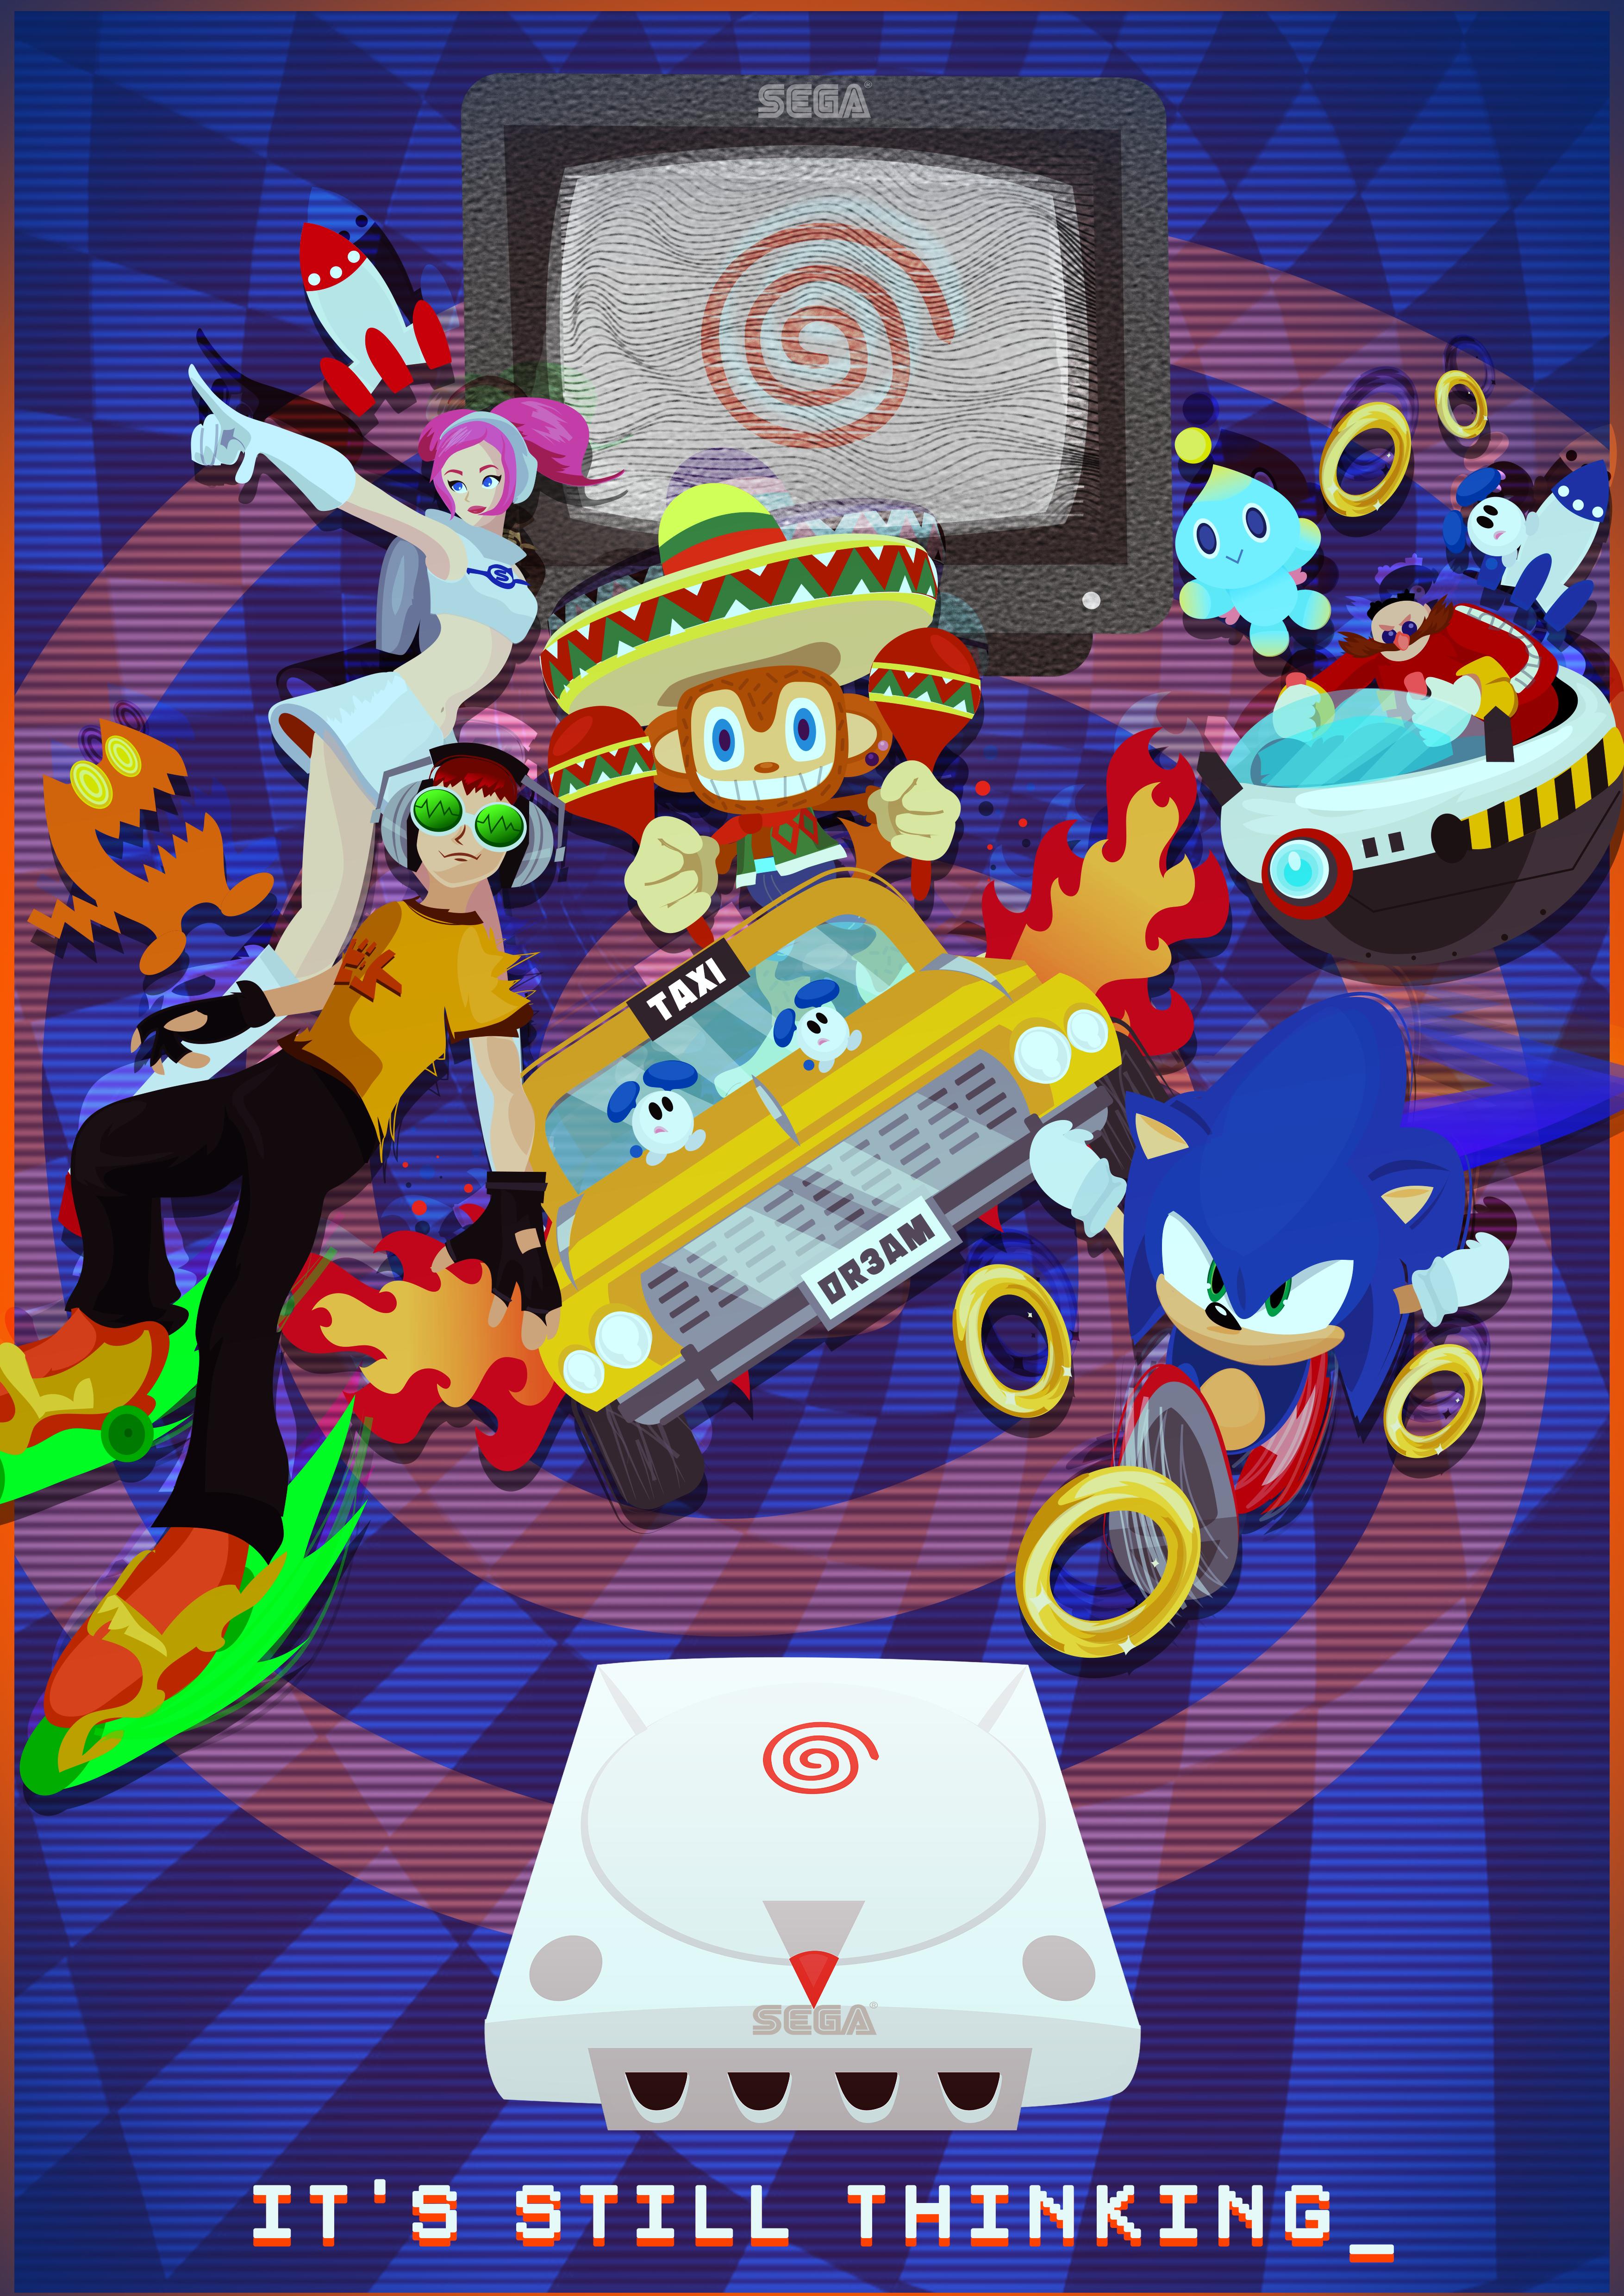 Sega Dreamcast Sega Dreamcast Geeky Wallpaper Retro Arcade